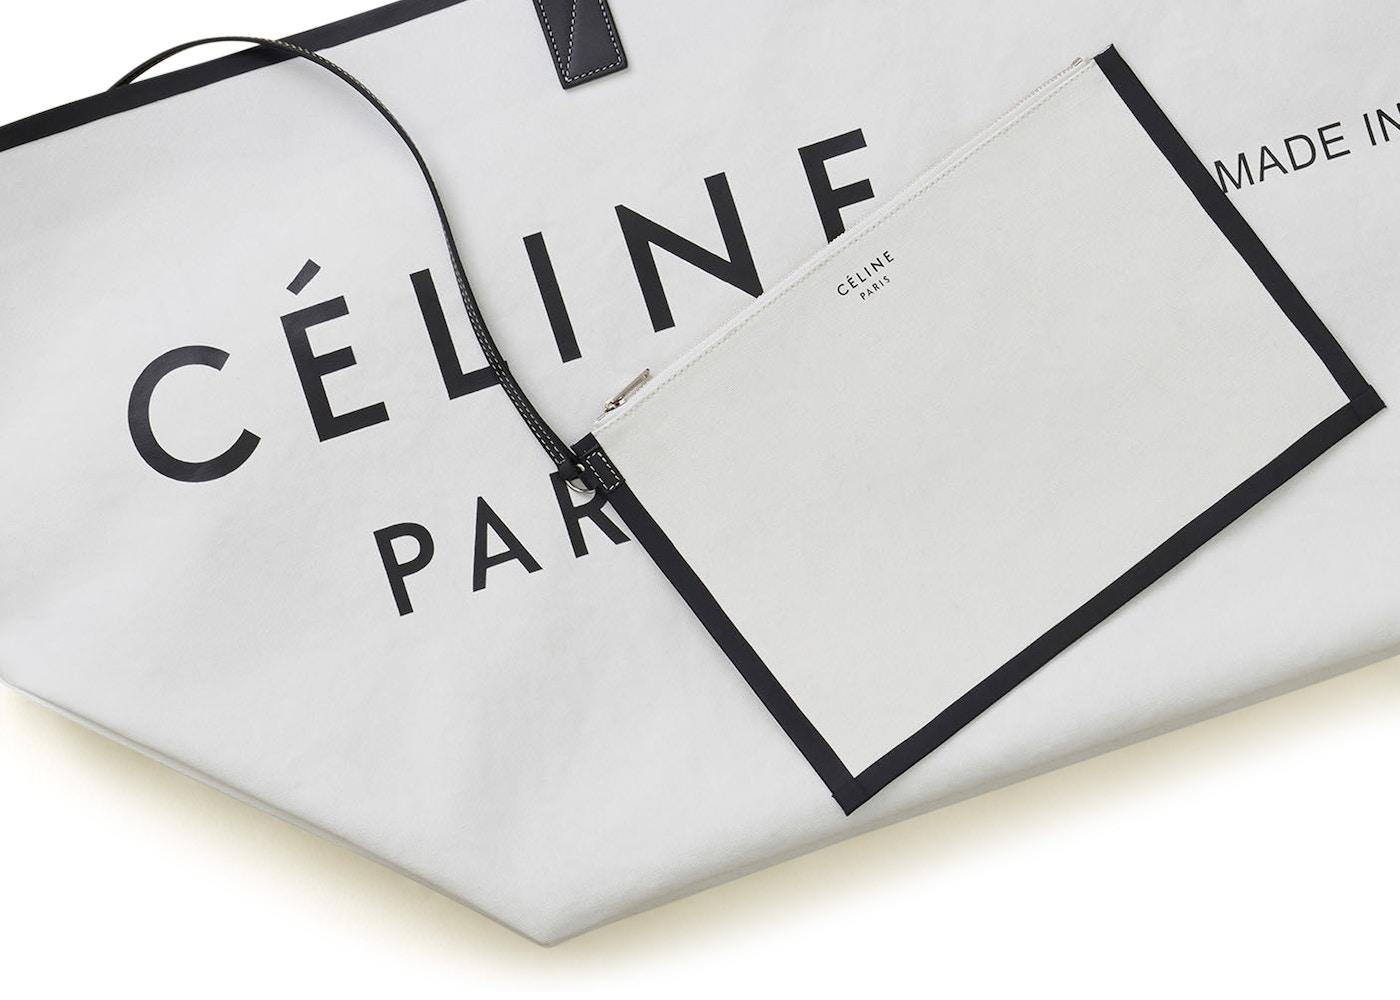 84078bb45ebc Celine Cabas Made In Large White Black